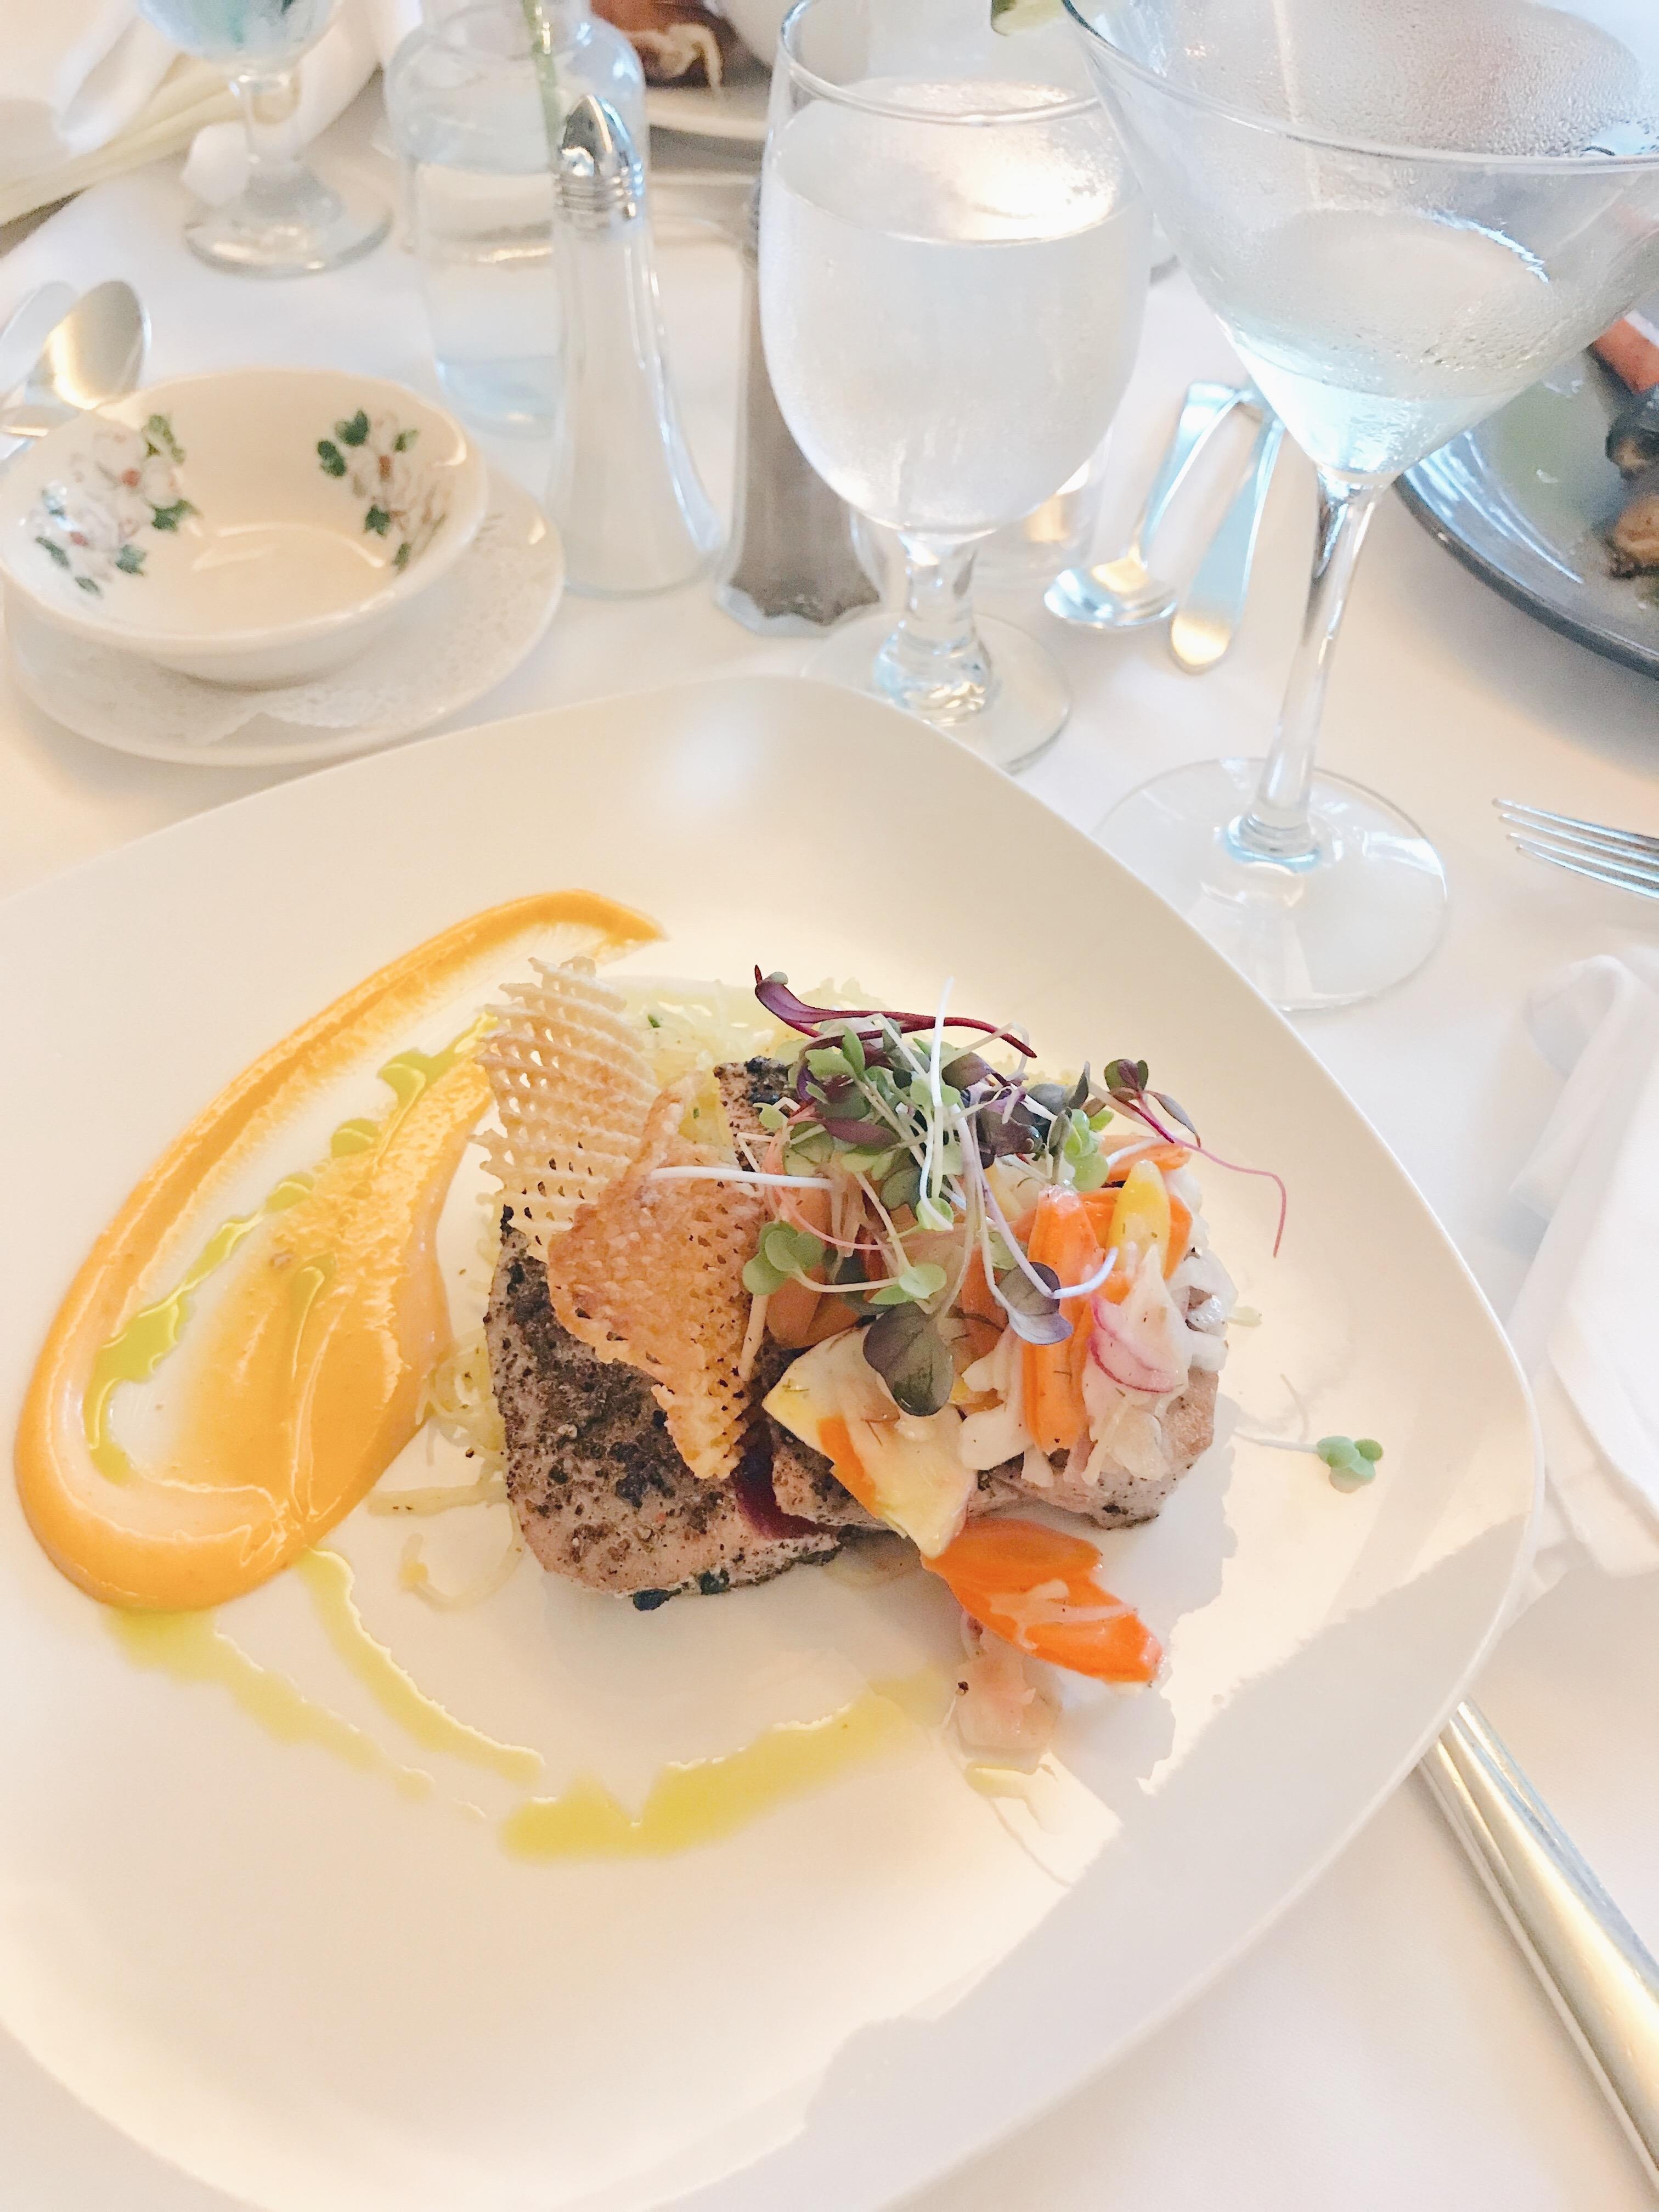 Basin Harbor Resort Review - Delicious Food